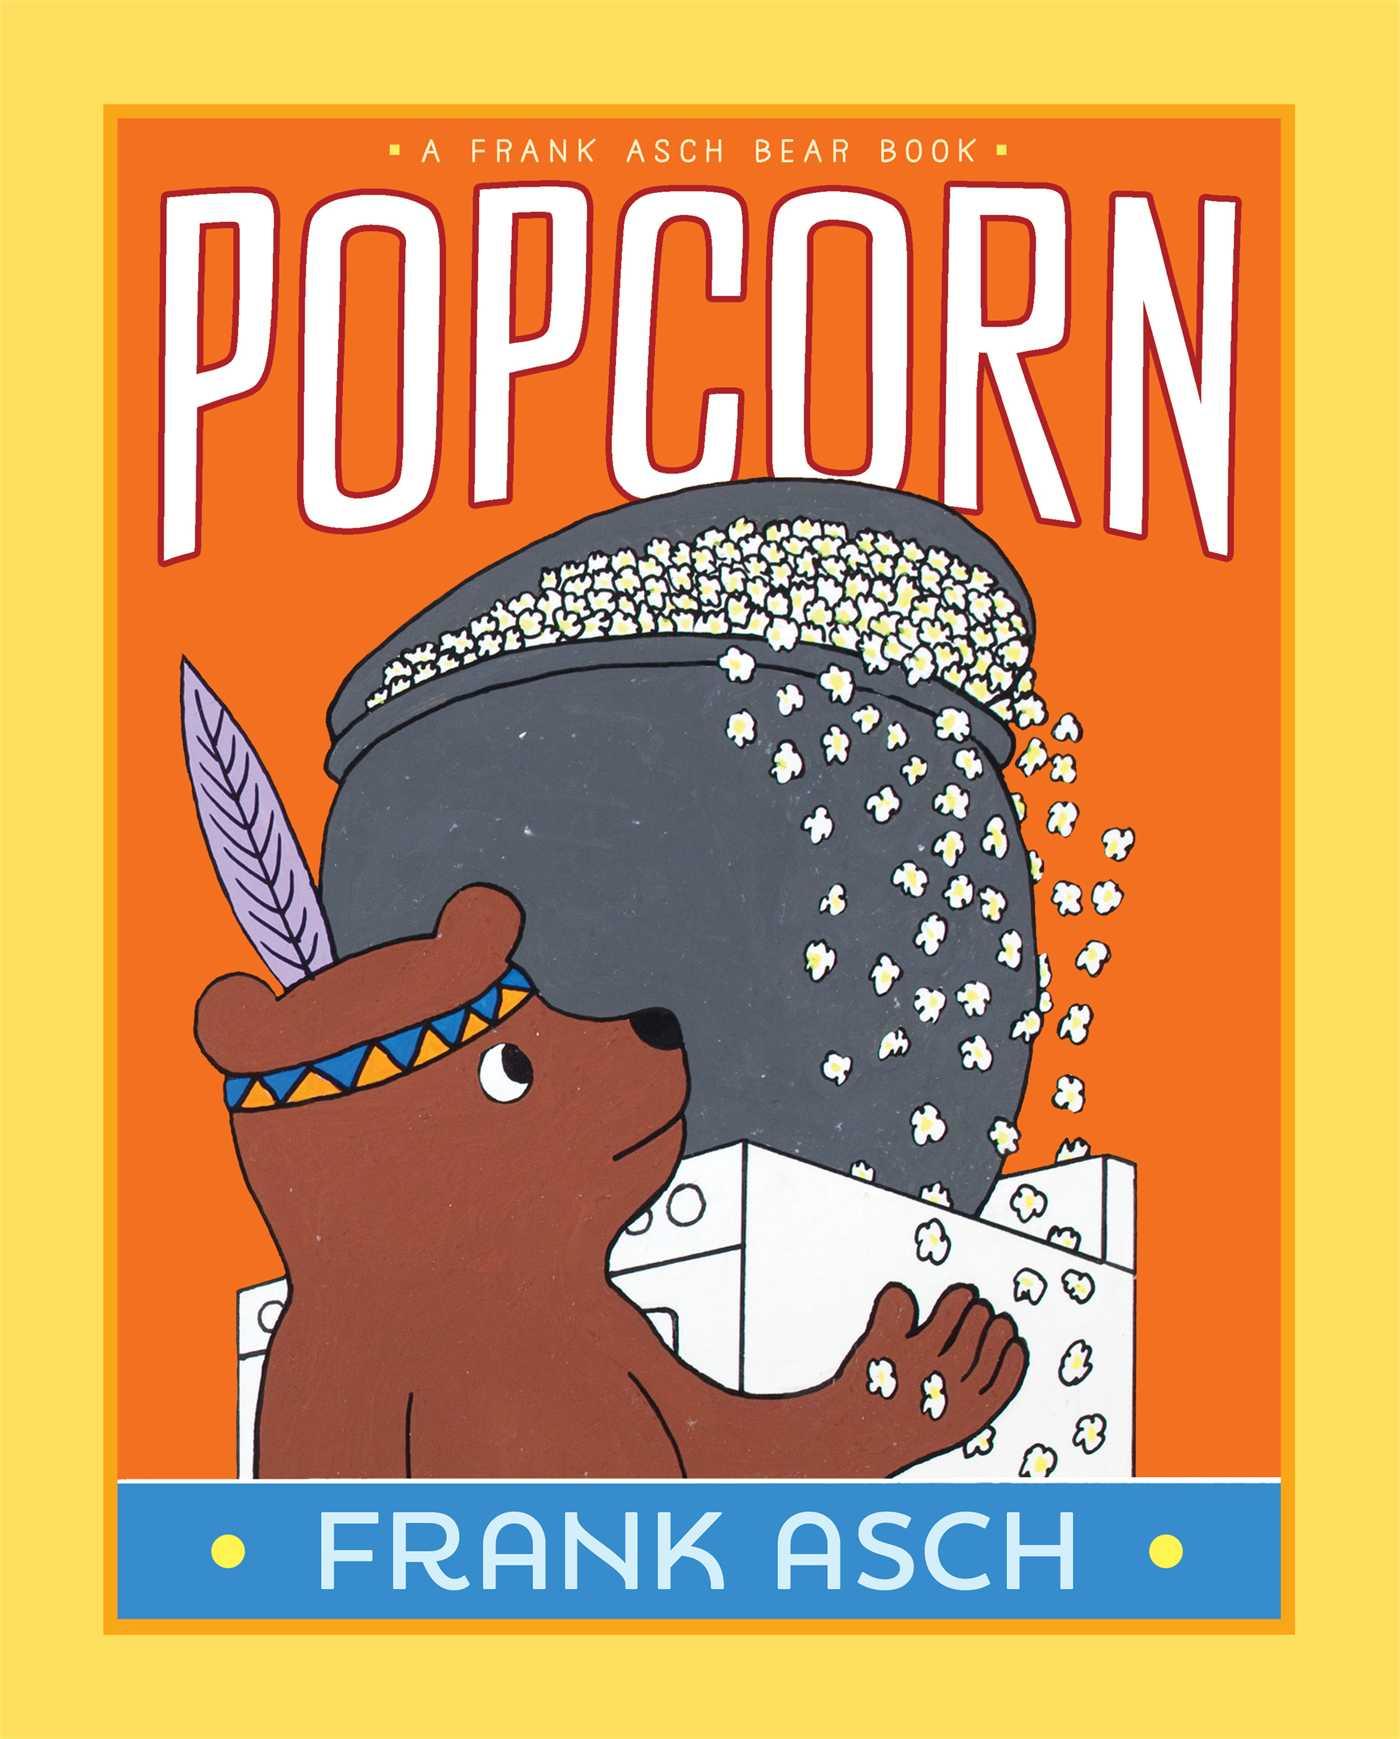 Popcorn 9781442466630 hr